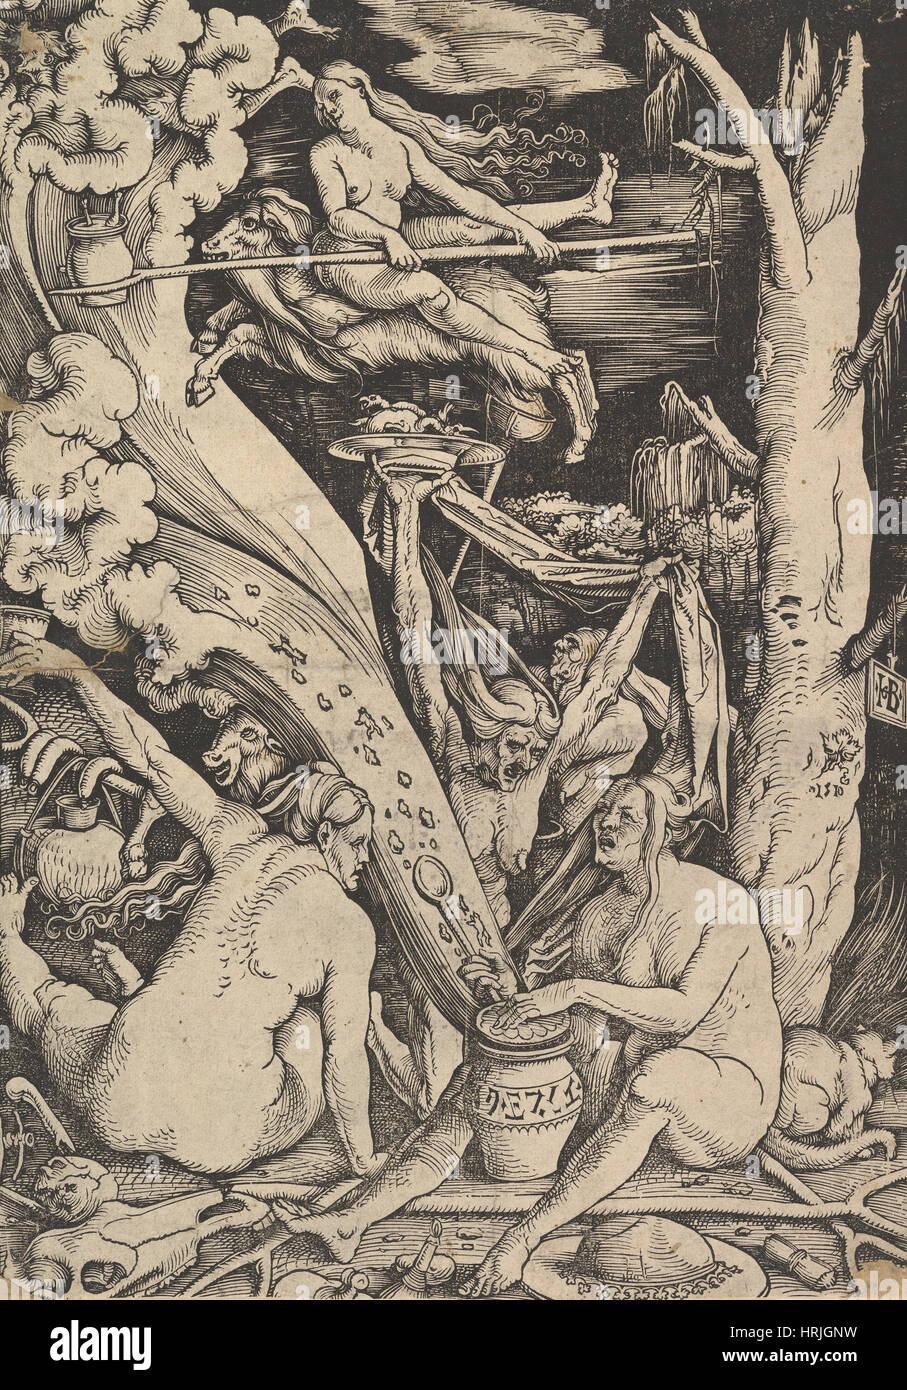 Witches' Sabbath, 1510 - Stock Image